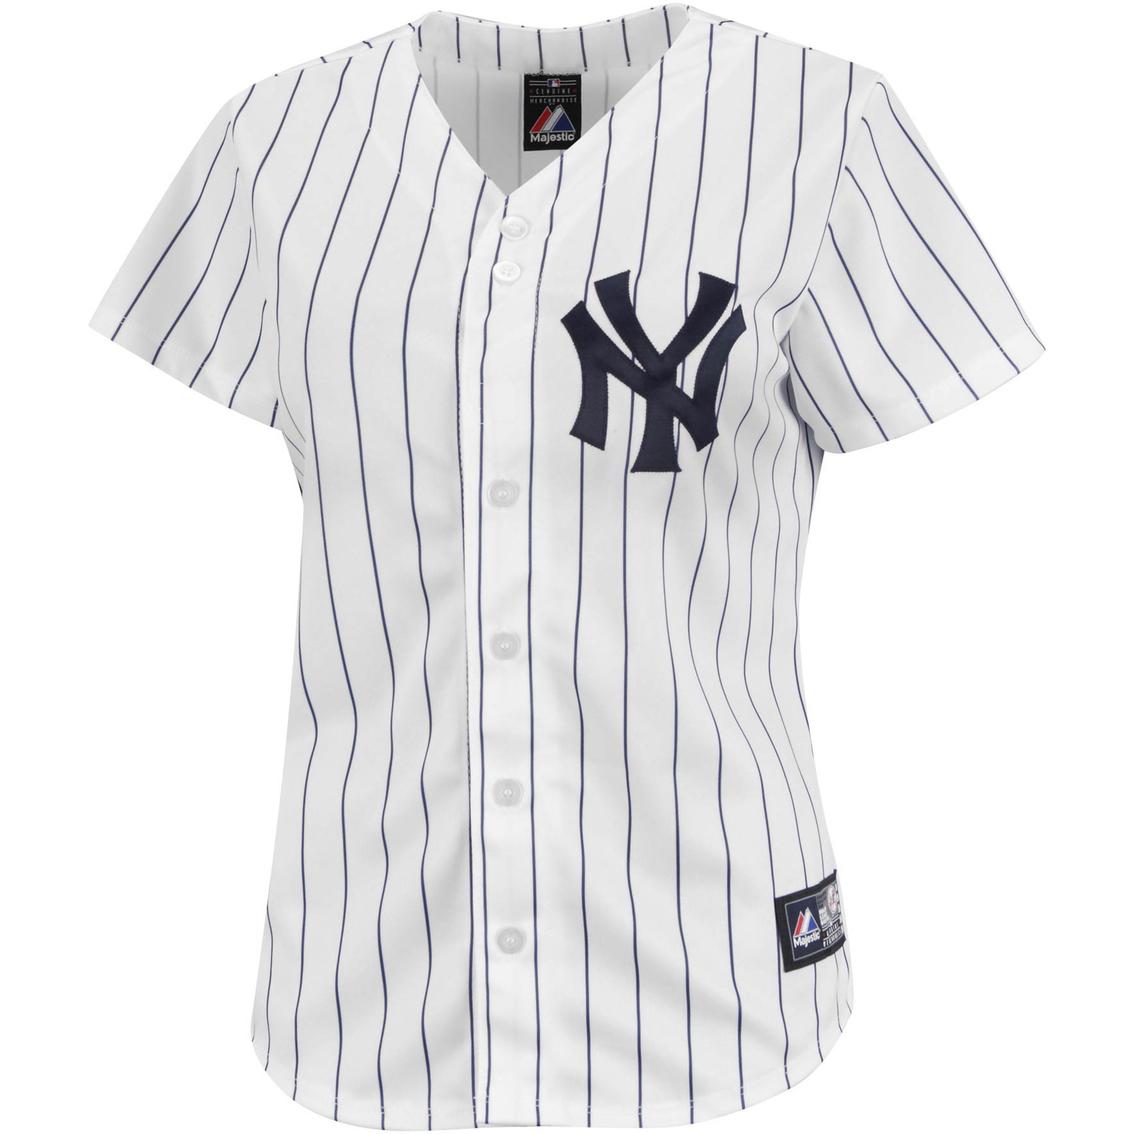 Majestic Mlb New York Yankees Replica Jersey Mlb Apparel